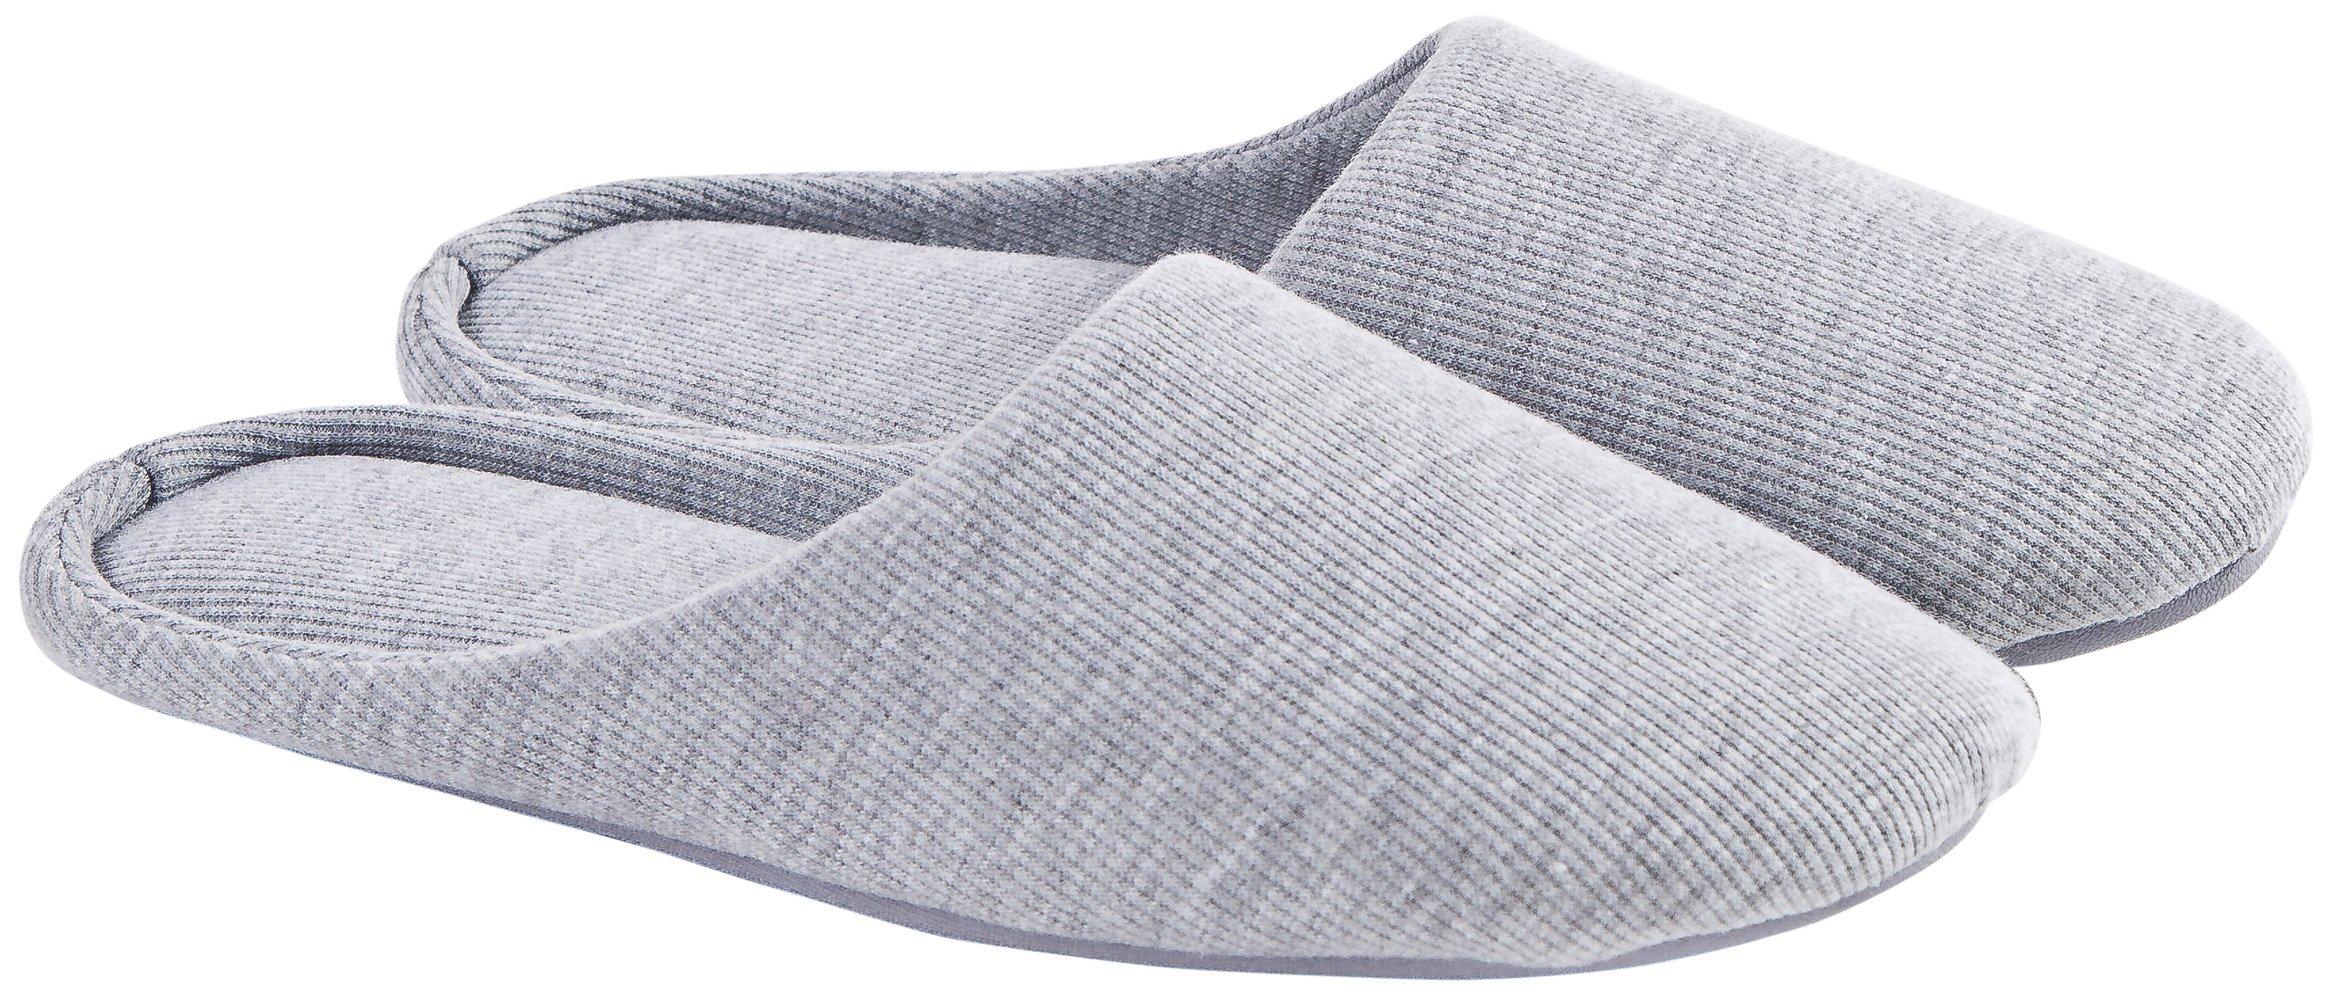 Ofoot Women's Cotton Memory Foam Washable Anti-slip Indoor Slippers Grey Size Medium 7-8 US